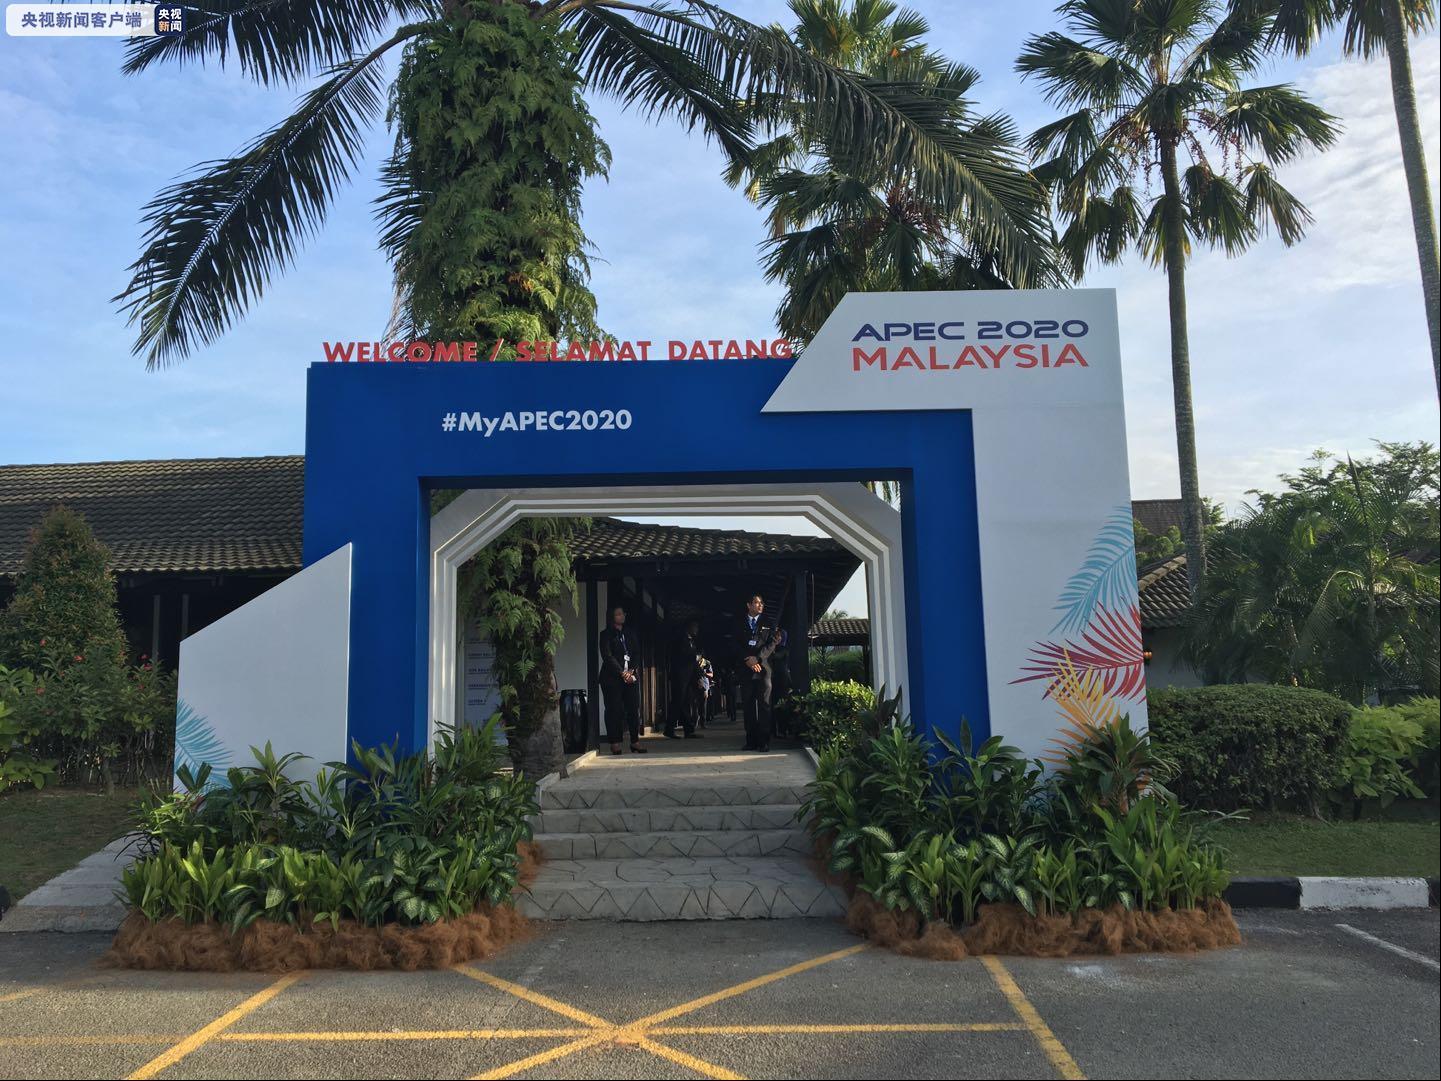 allbet电脑版下载:马来西亚宣布2020亚太经合组织峰会将如期举行 第1张